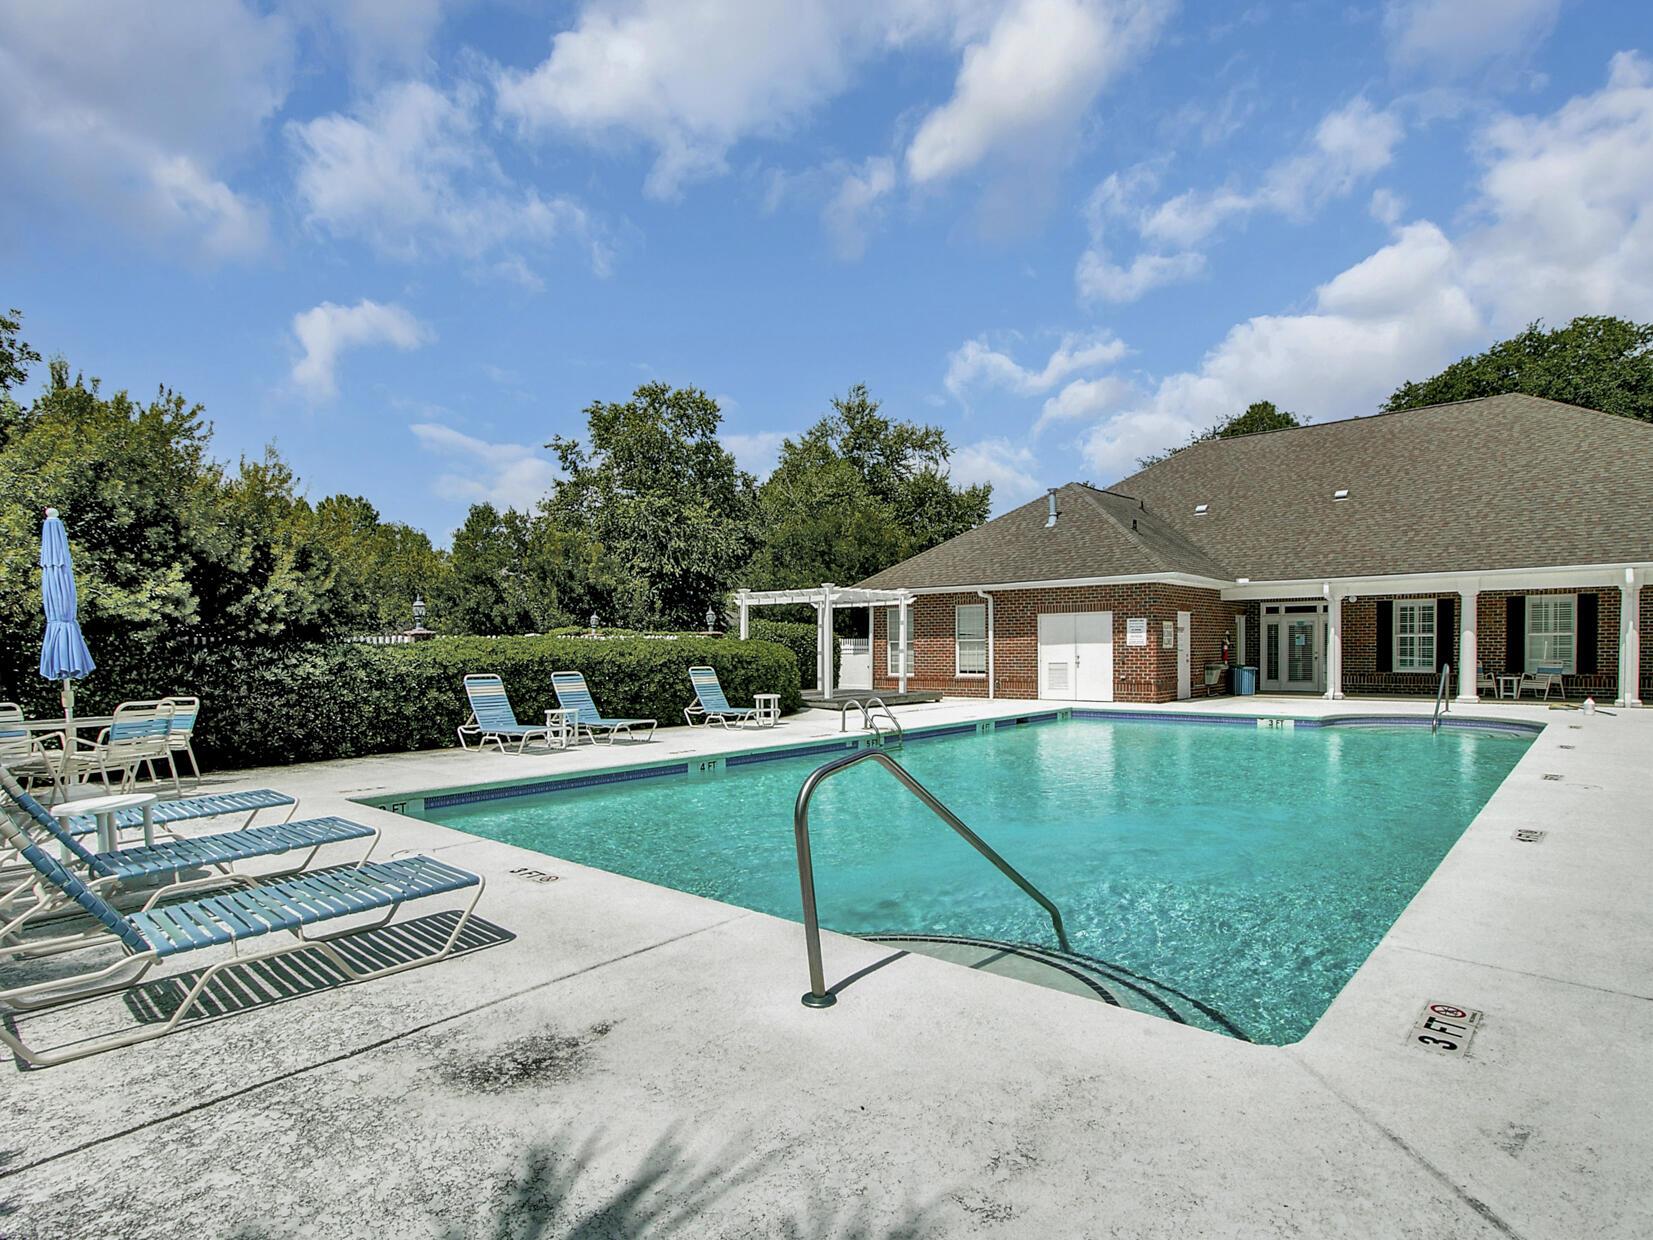 Cambridge Lakes Homes For Sale - 1485 Cambridge Lakes, Mount Pleasant, SC - 10